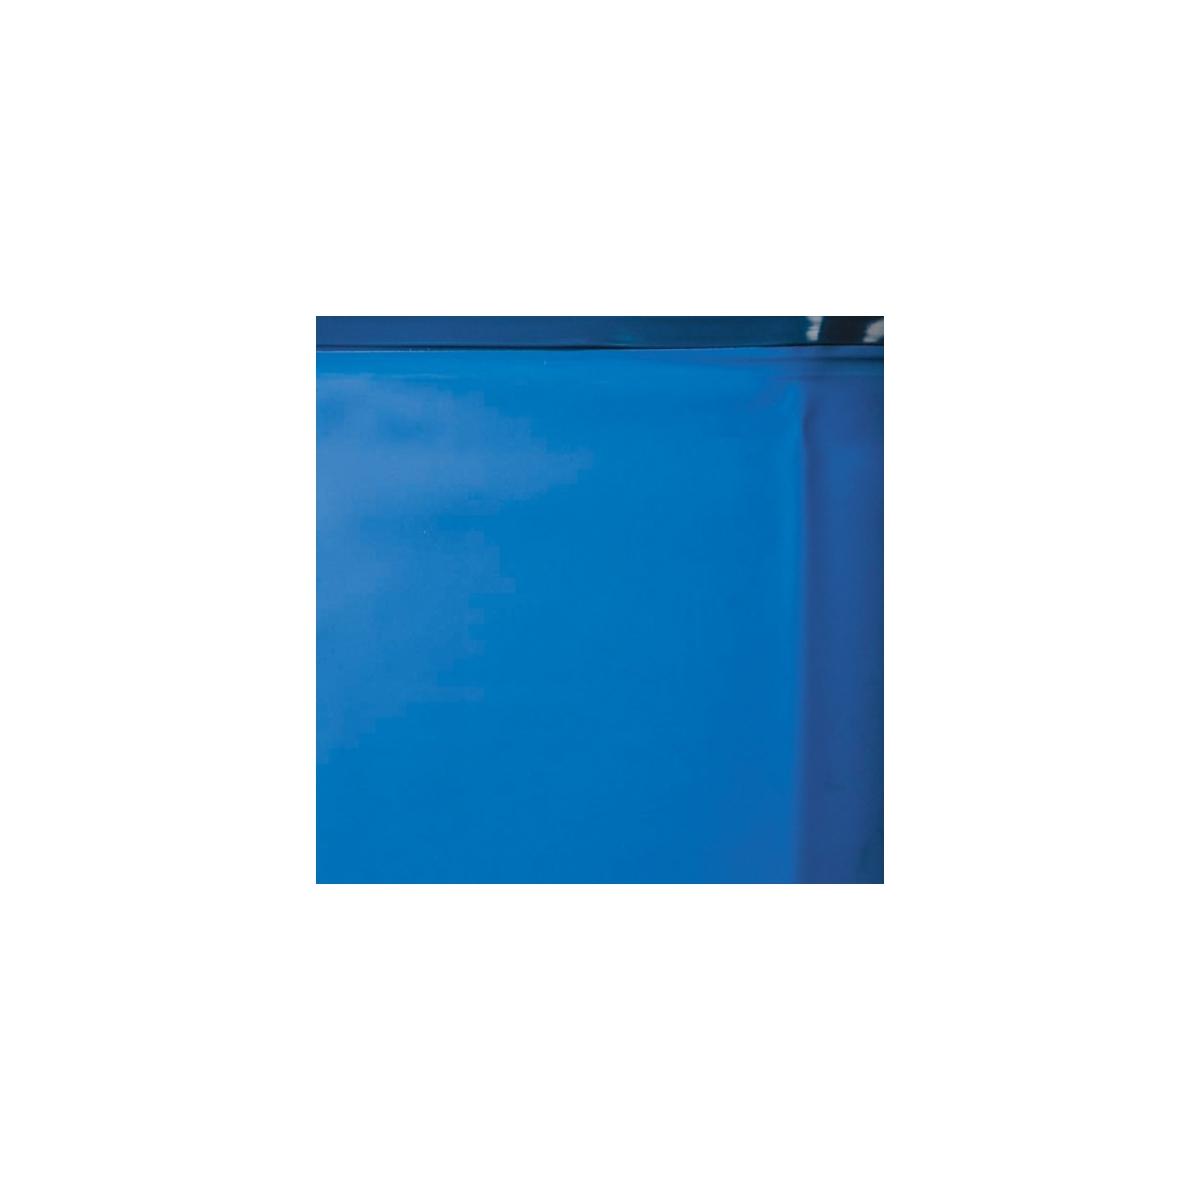 Liner Azul piscina Gre redonda 20/100 - Altura 65 - Sistema Overlap